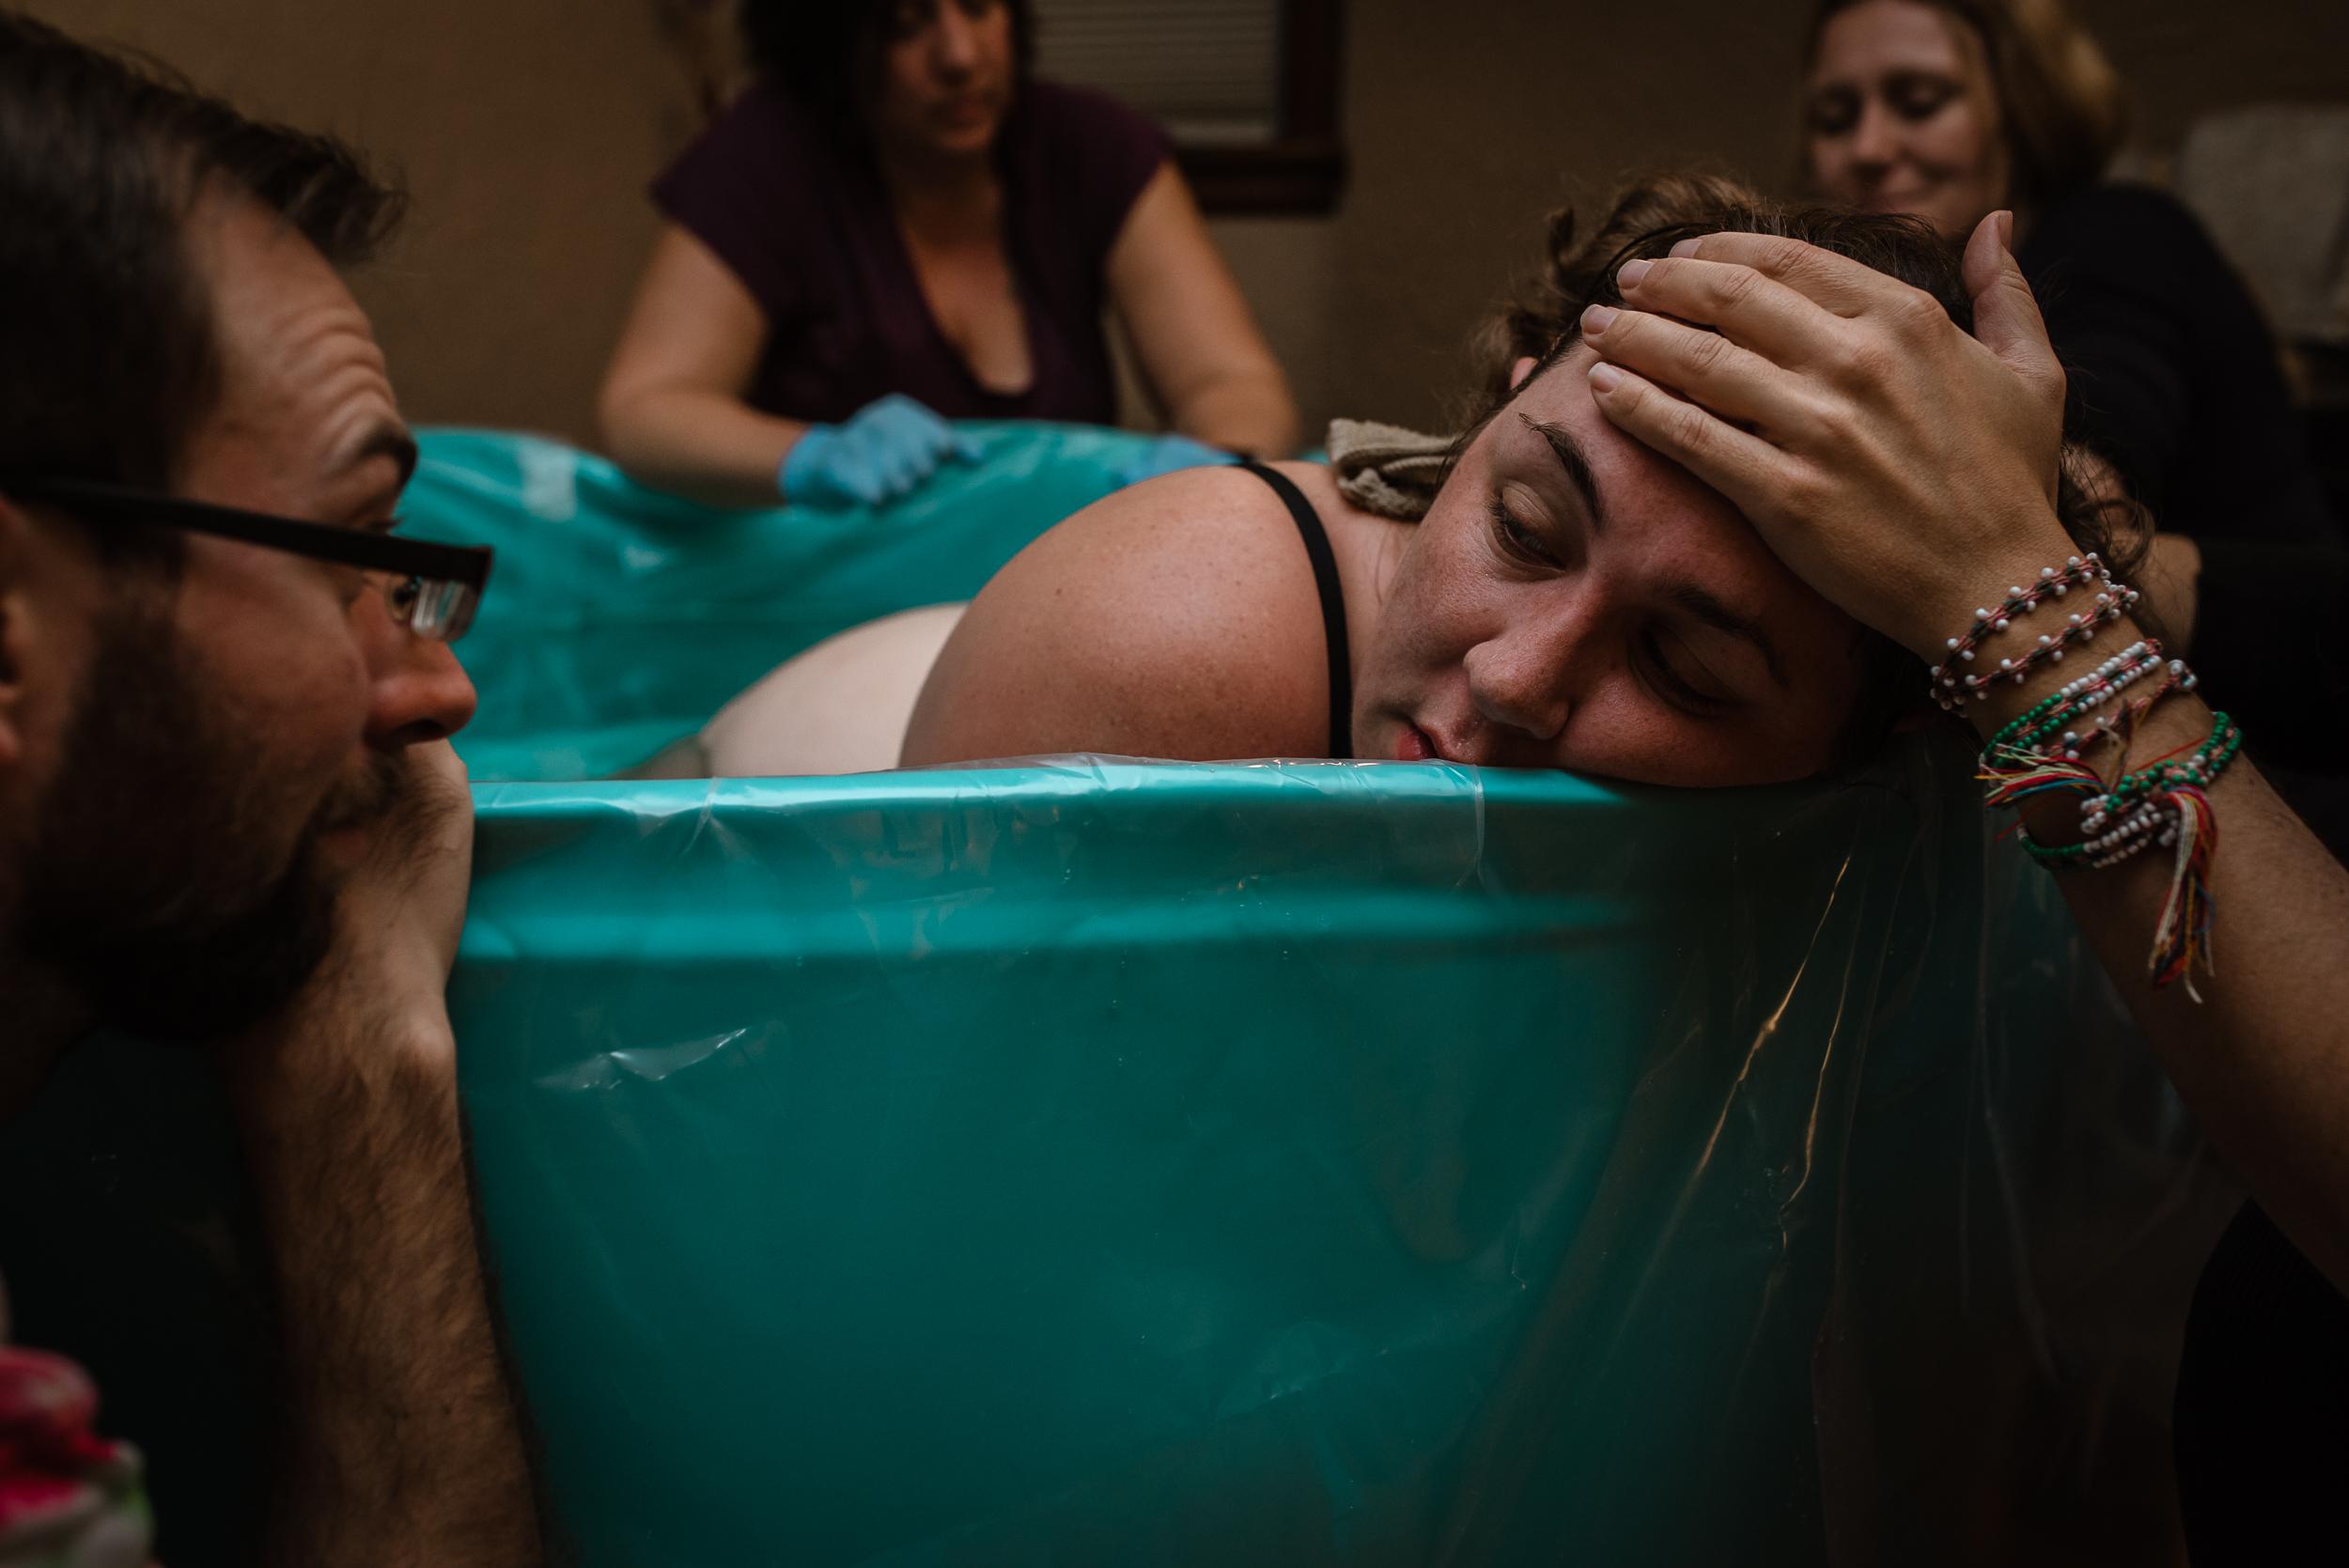 Meredith Westin Photography- Minneapolis Birth Stories and Films-November 08, 2018-185221.jpg